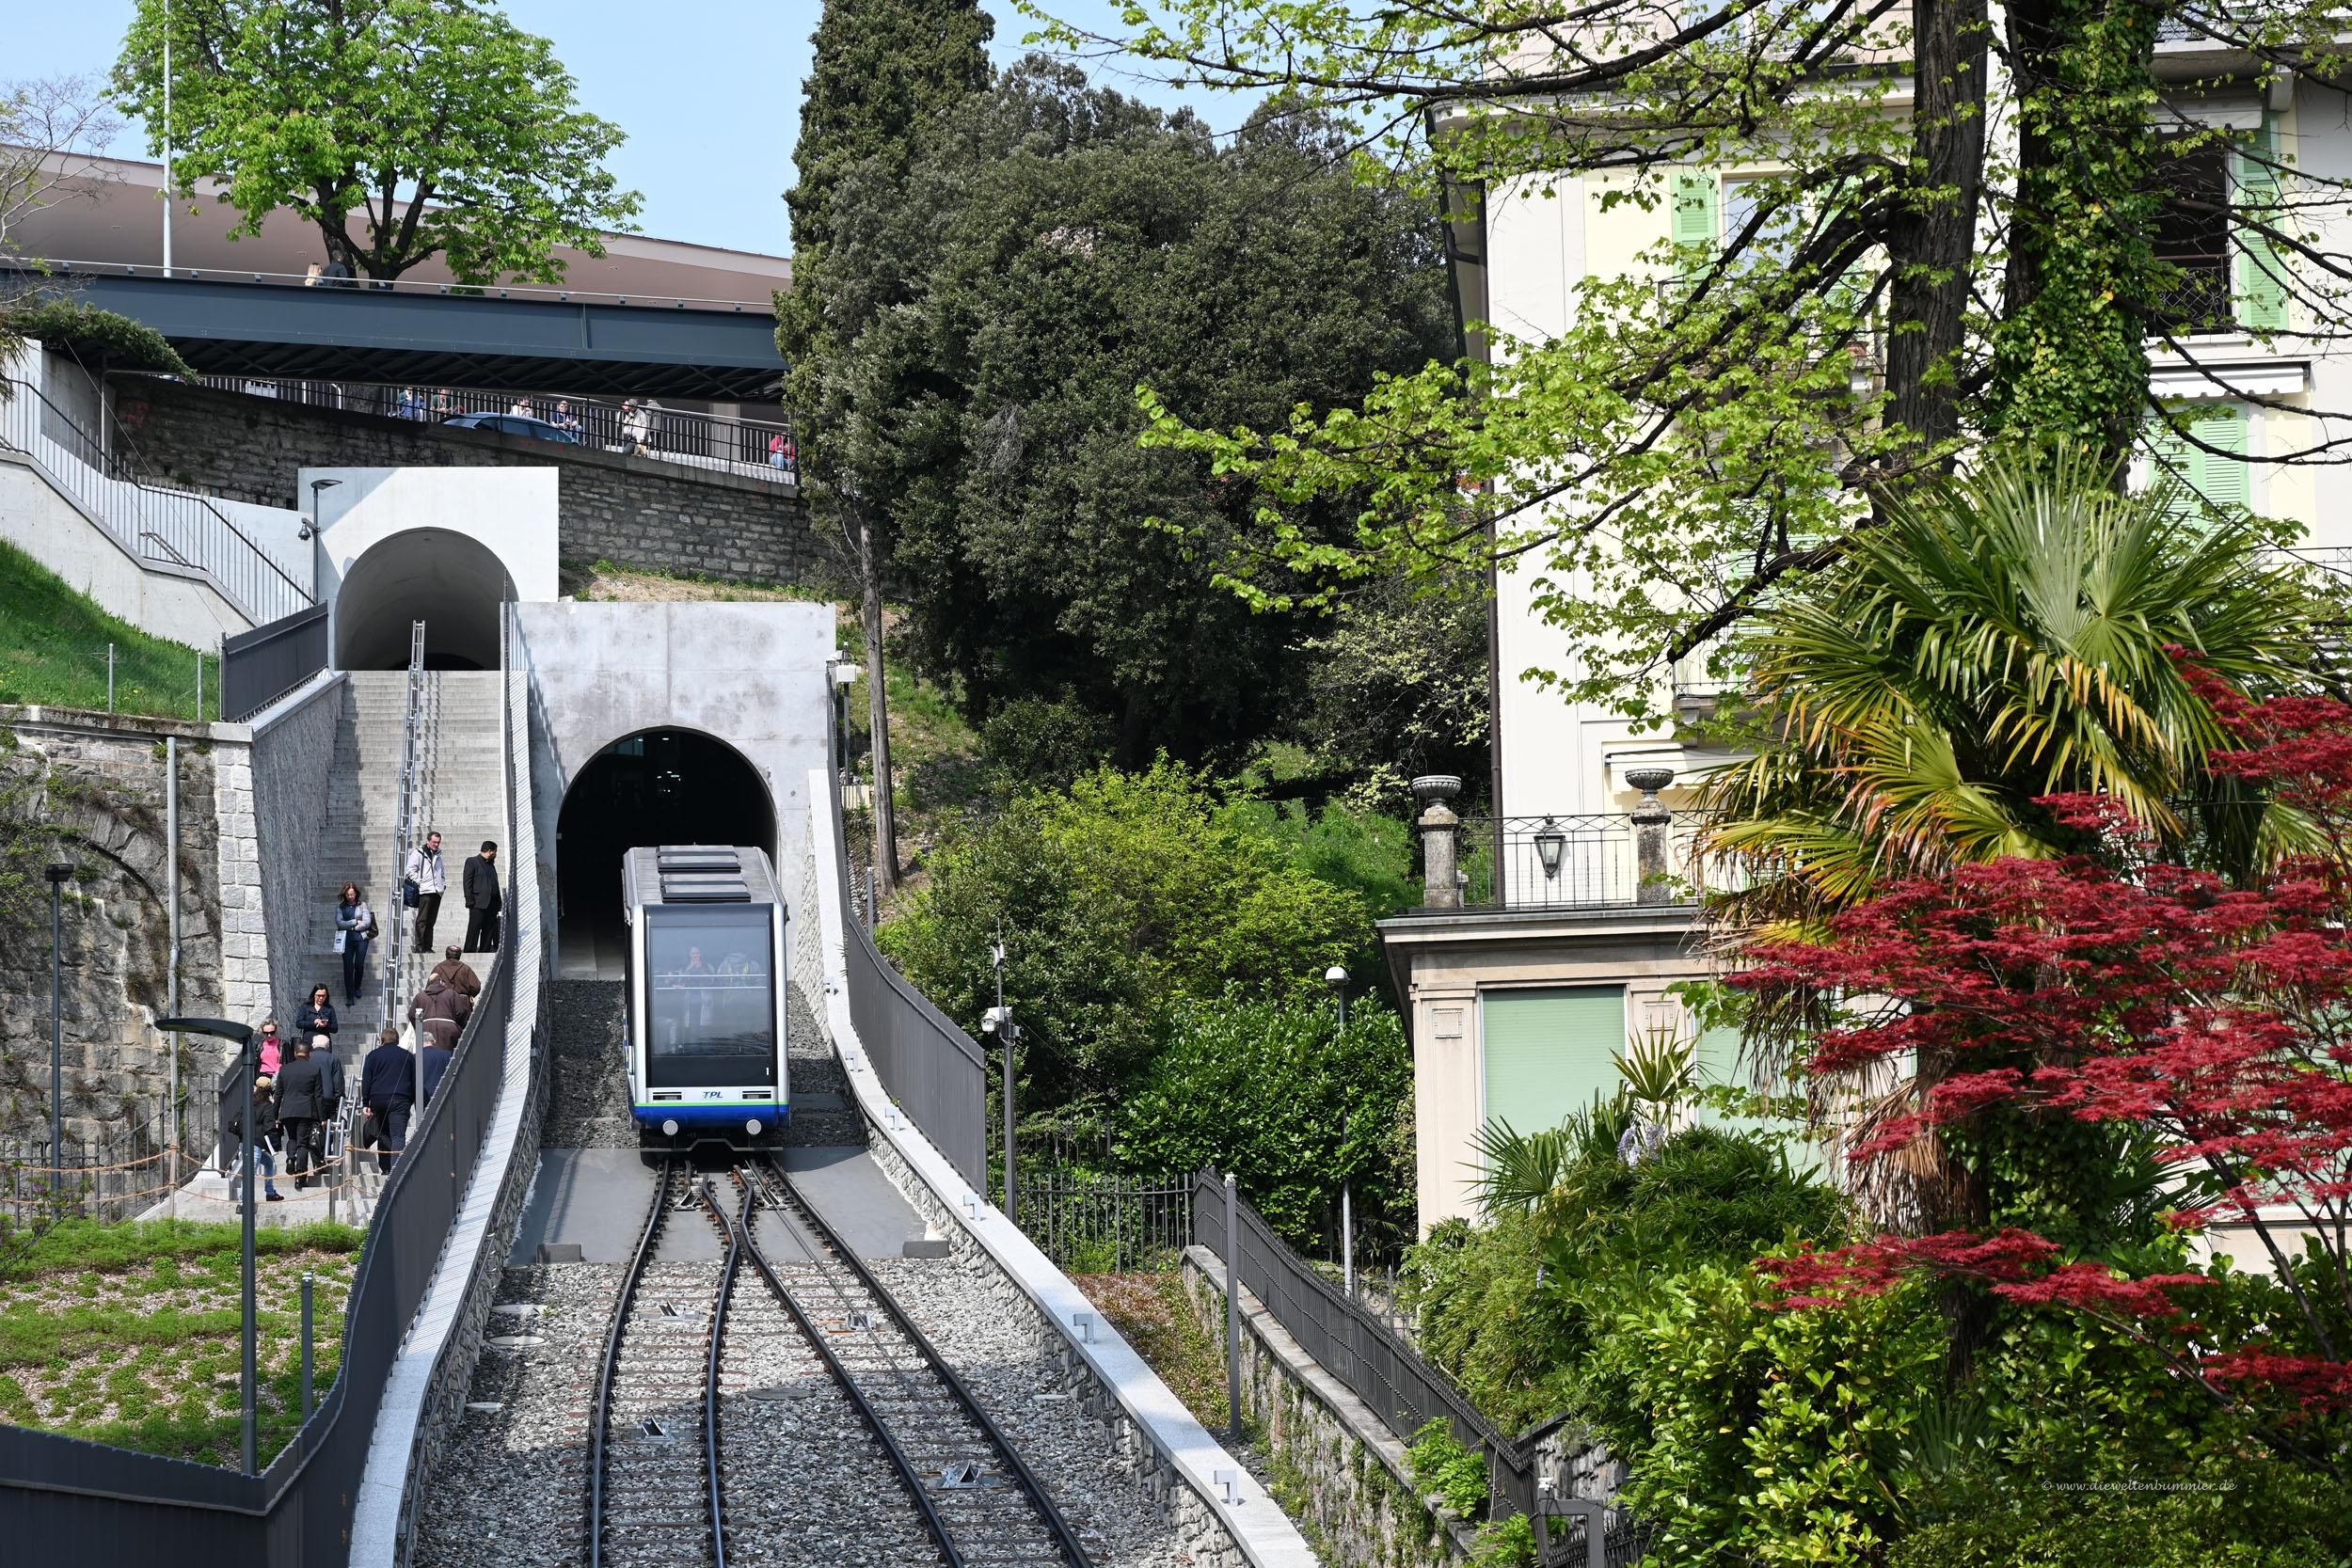 Zahnradbahn in Lugano